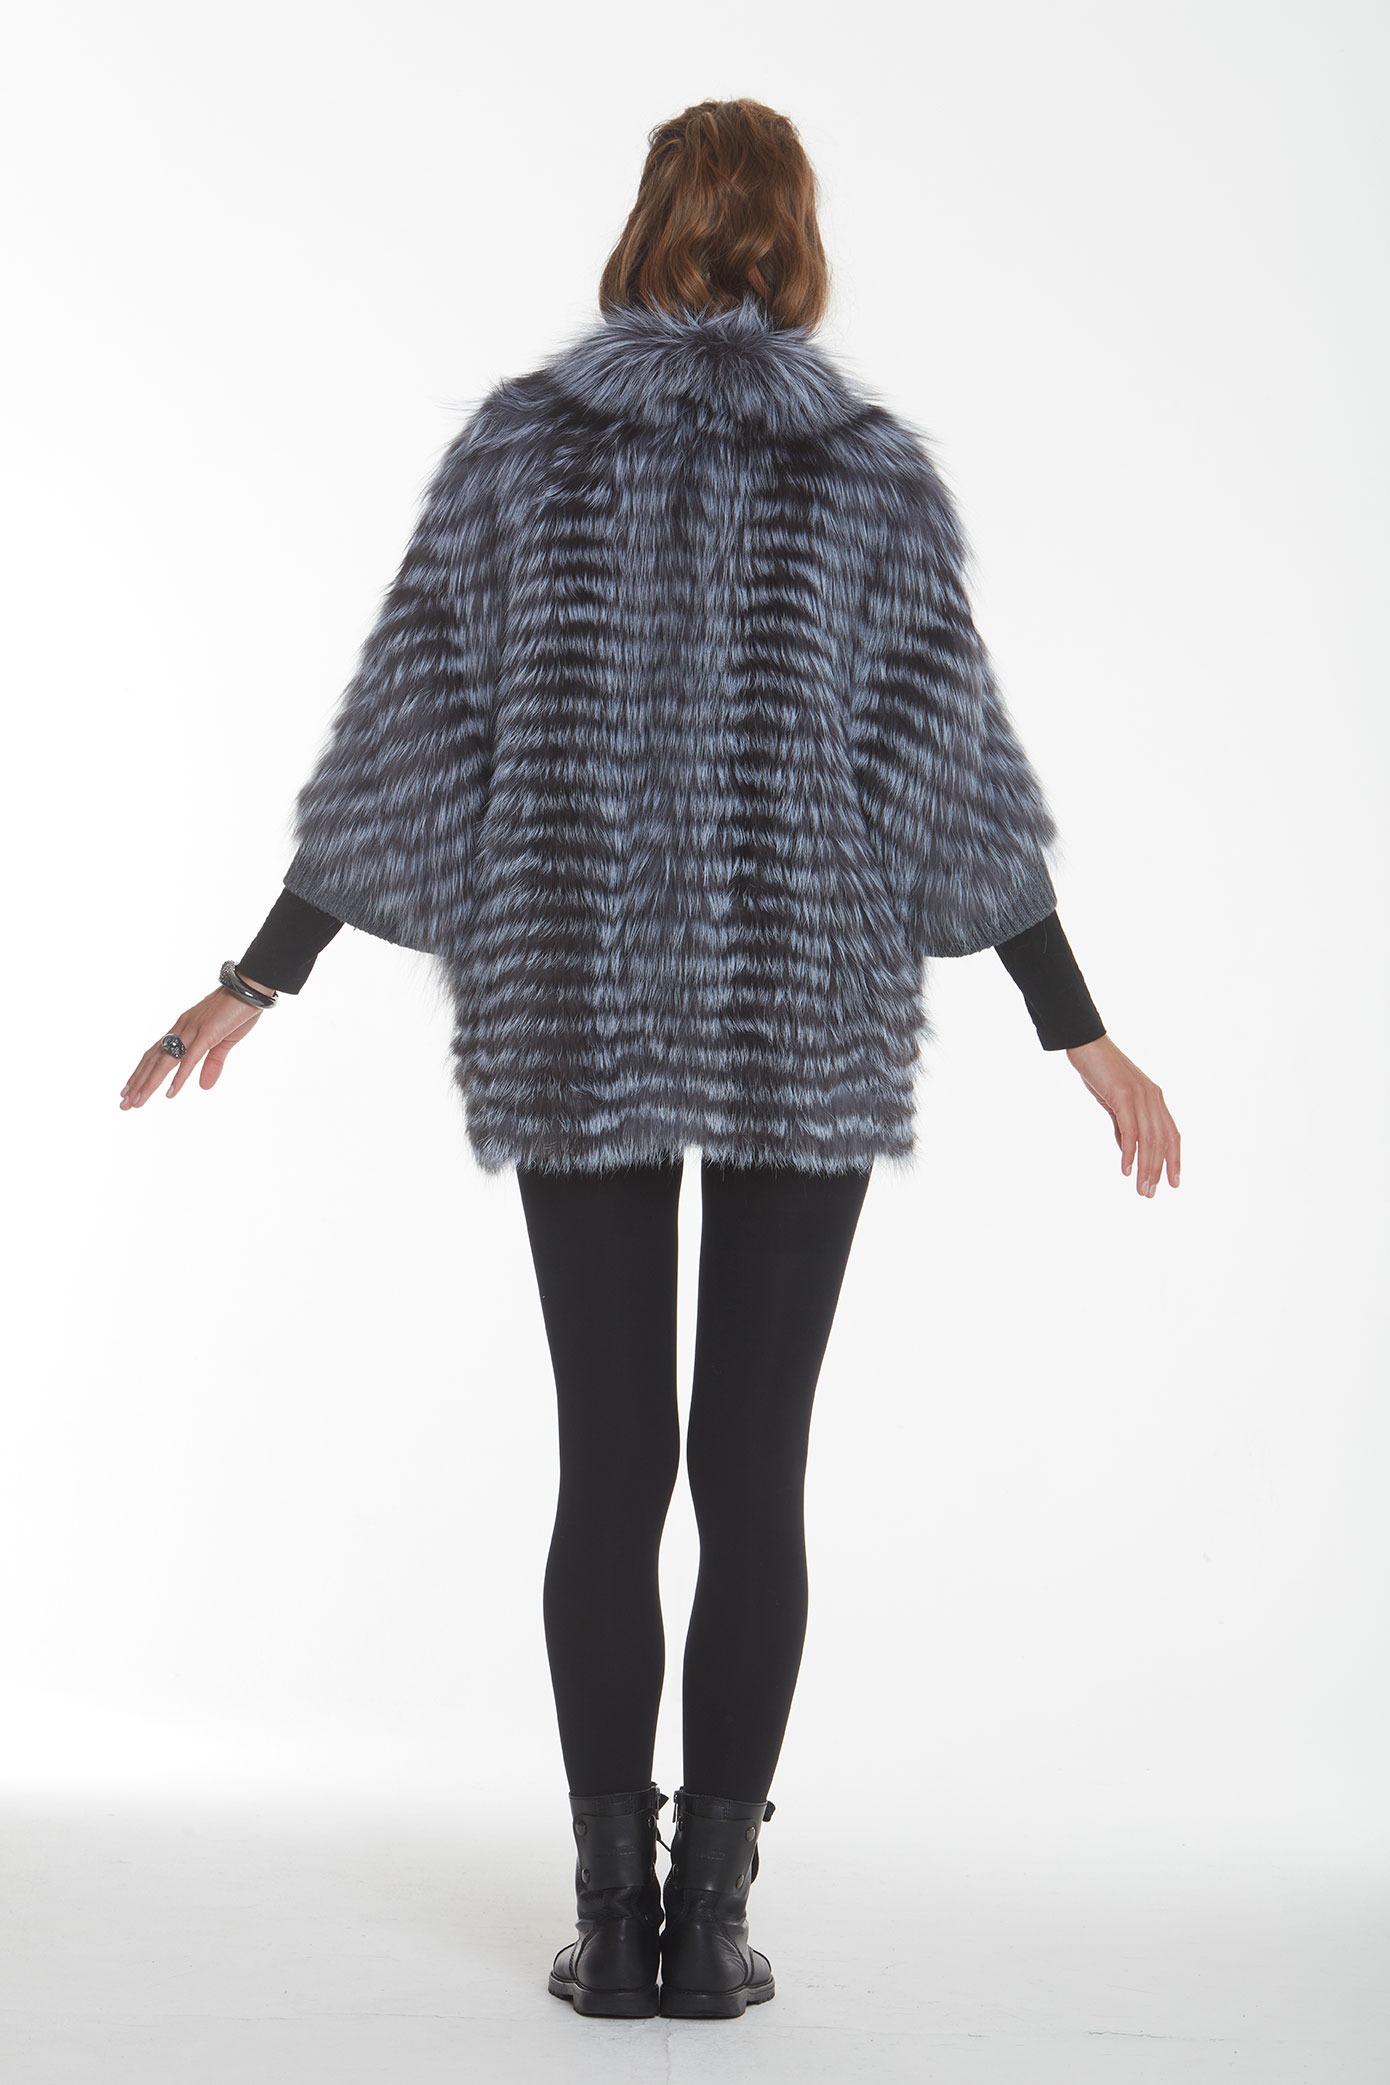 Fox fur sweater back view